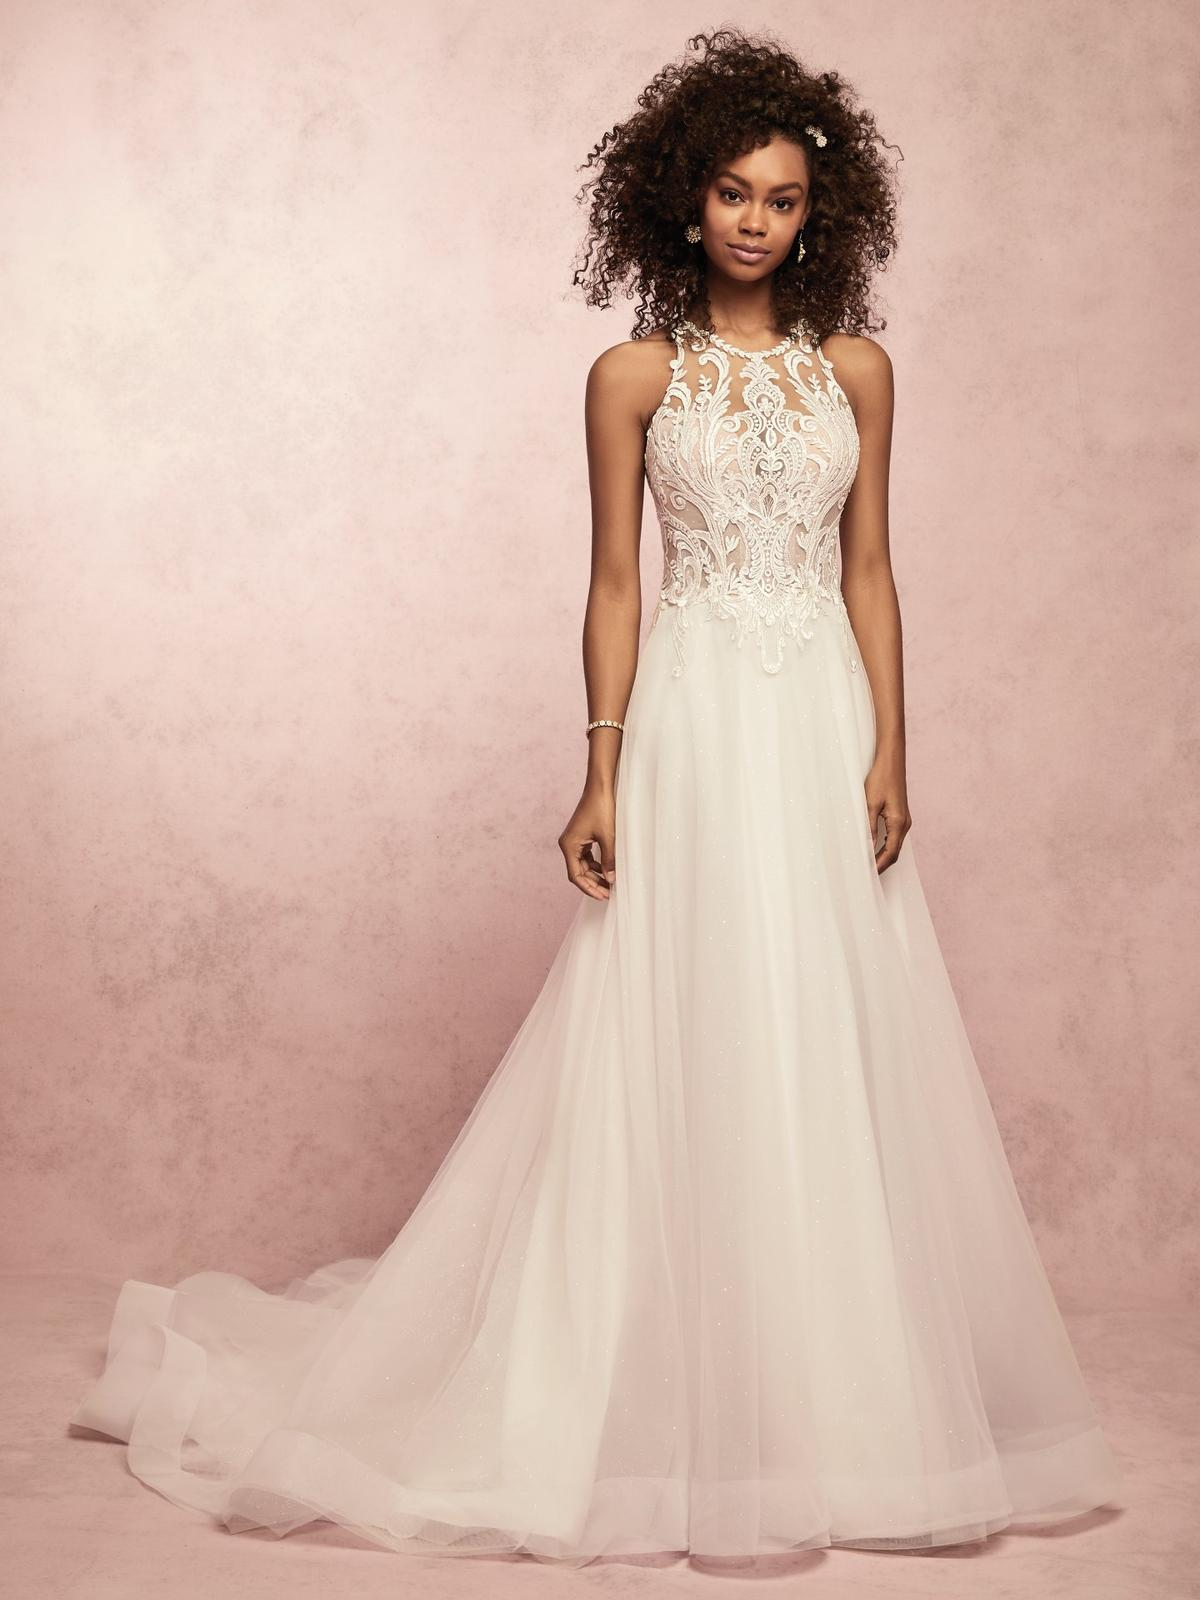 Nové svadobné šaty ♥ ARDELLE♥ v Žiline - ARDELLE (nová kolekcia)